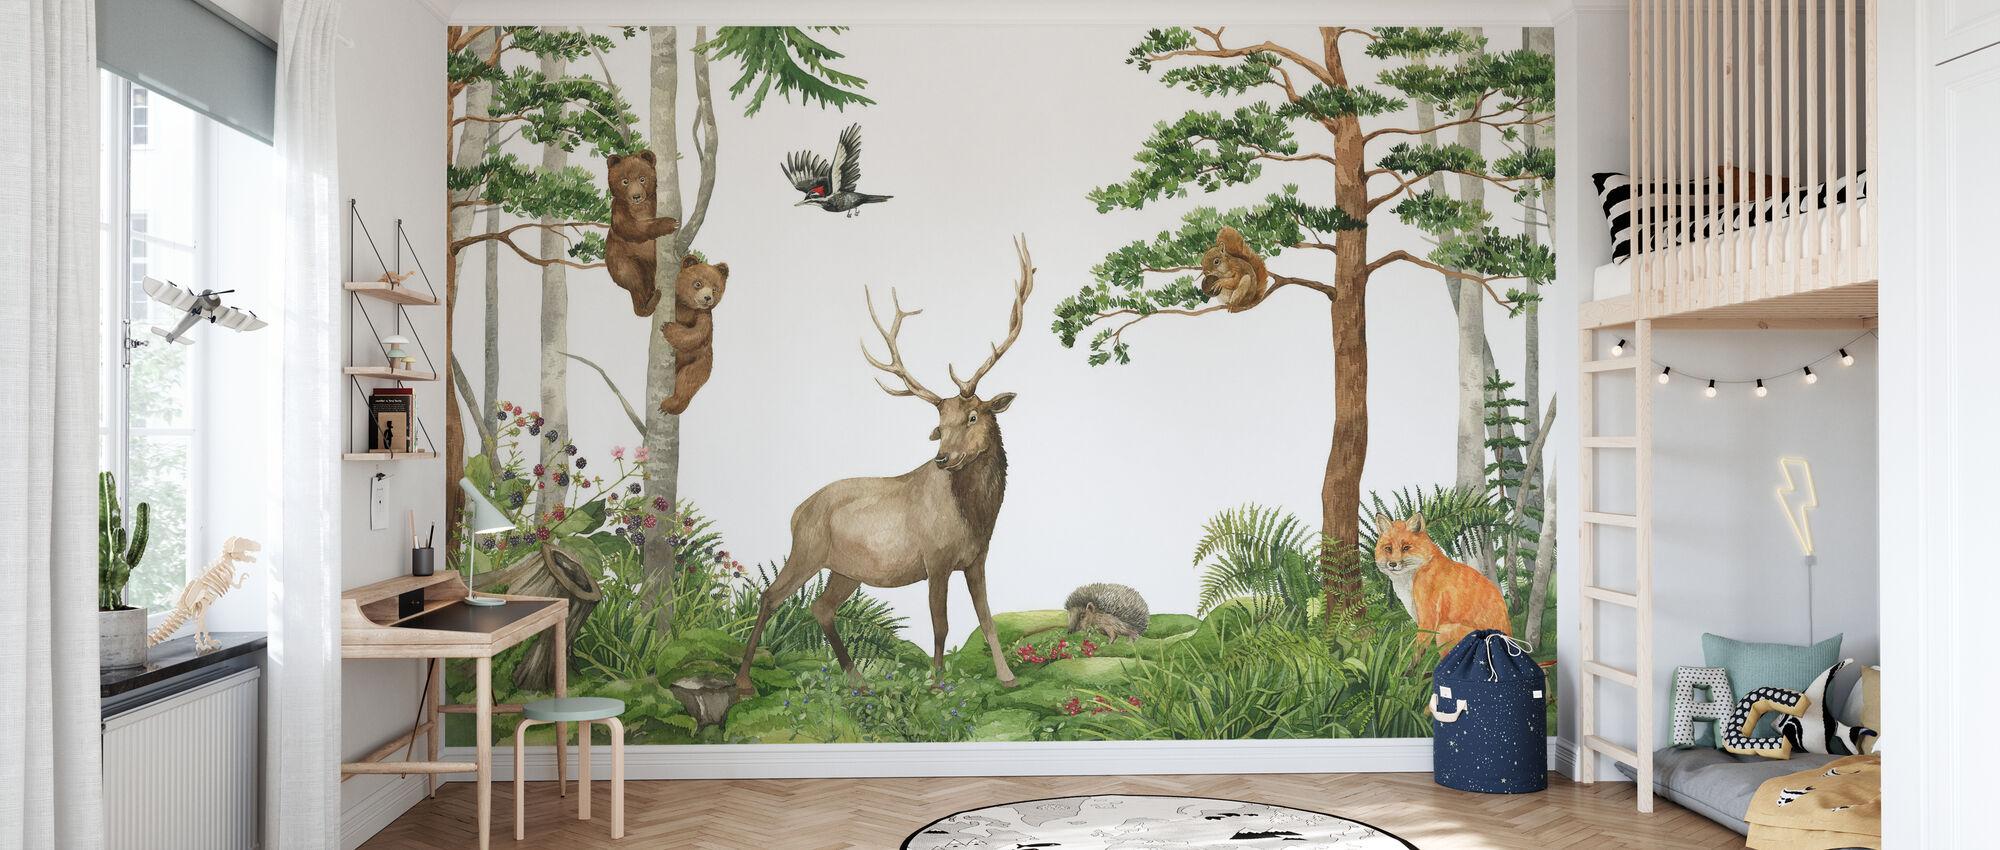 Nordic Forest Friends - Wallpaper - Kids Room